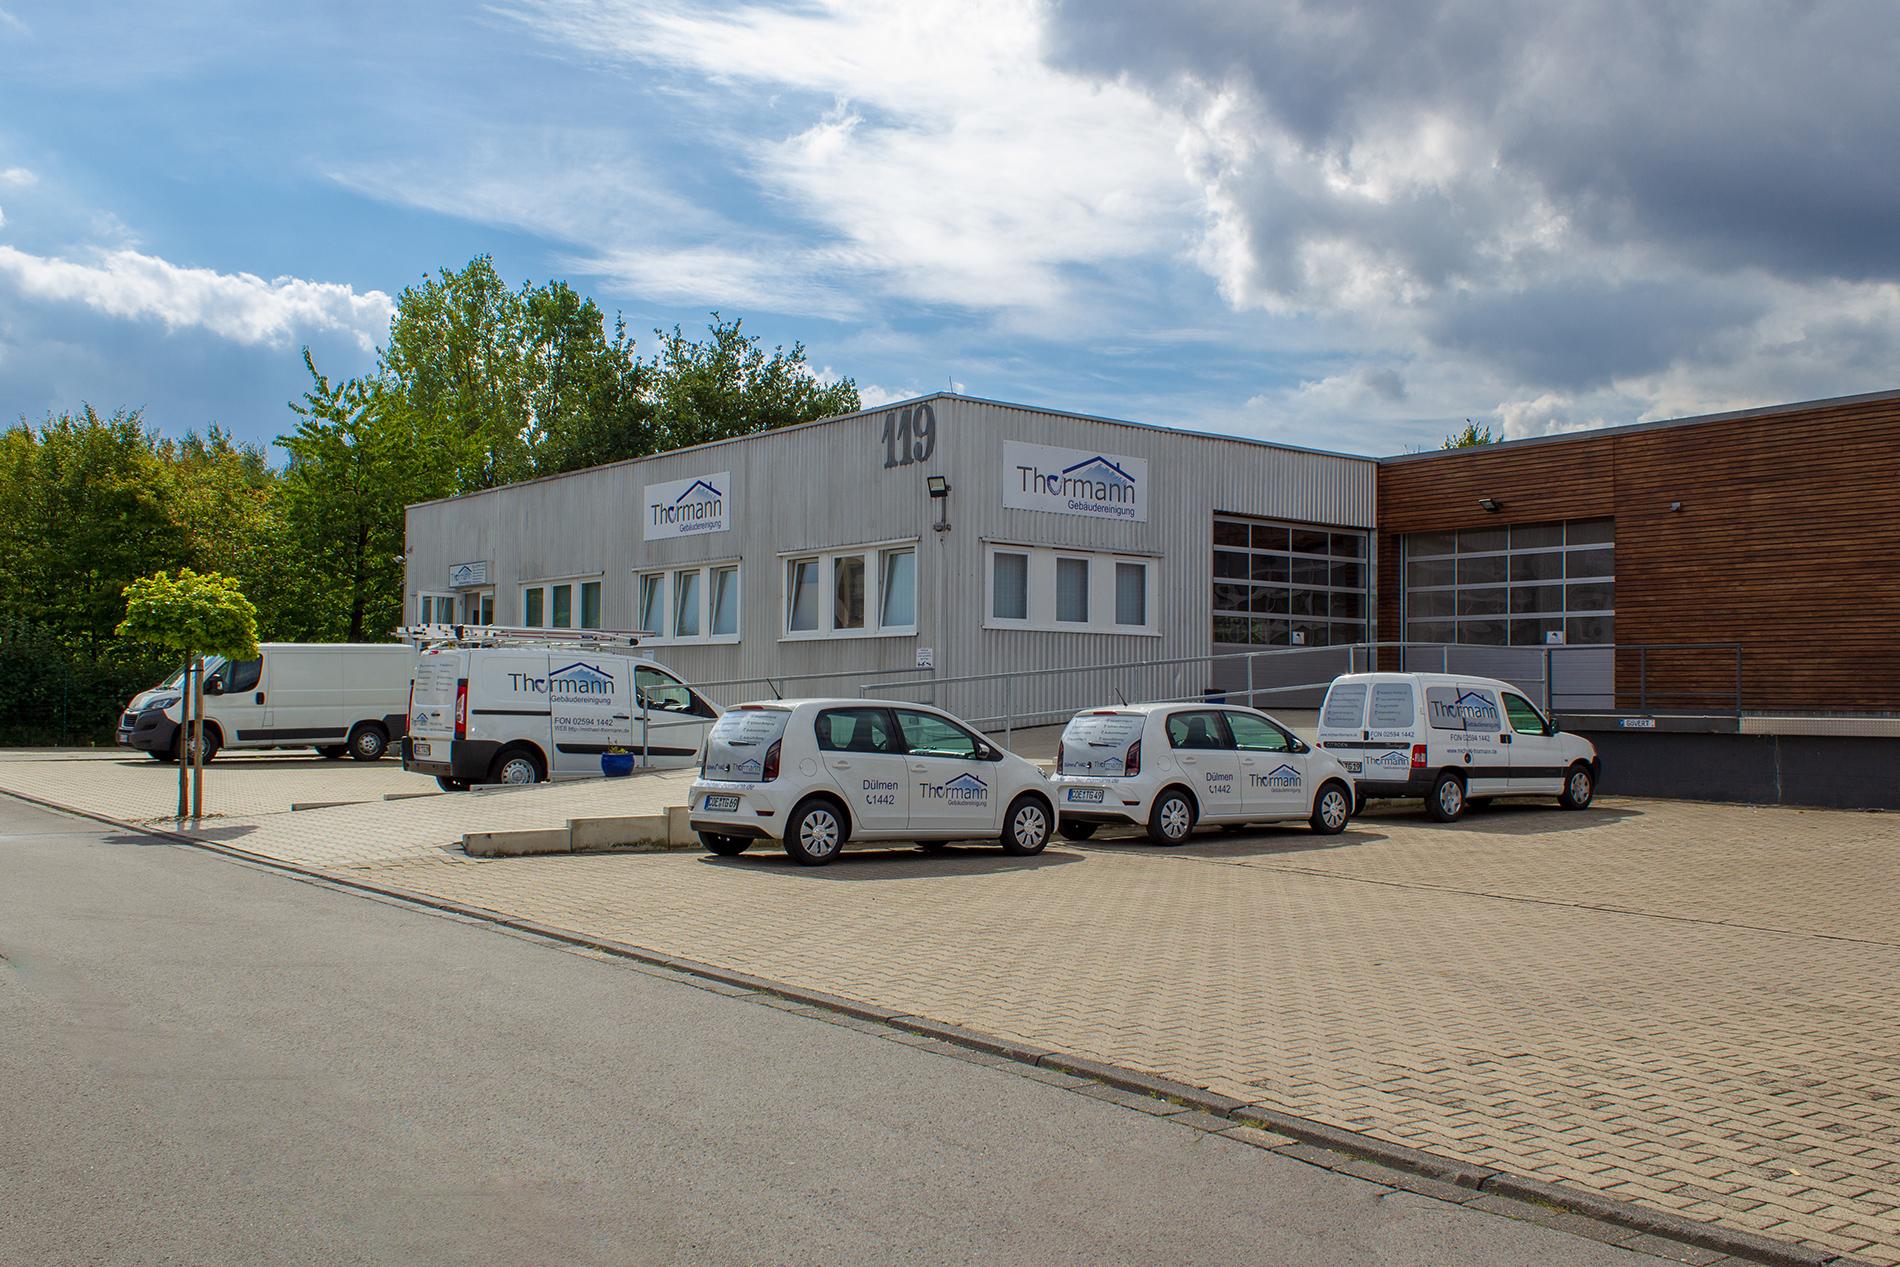 Thormann Gebäudereinigung Dülmen Coesfeld